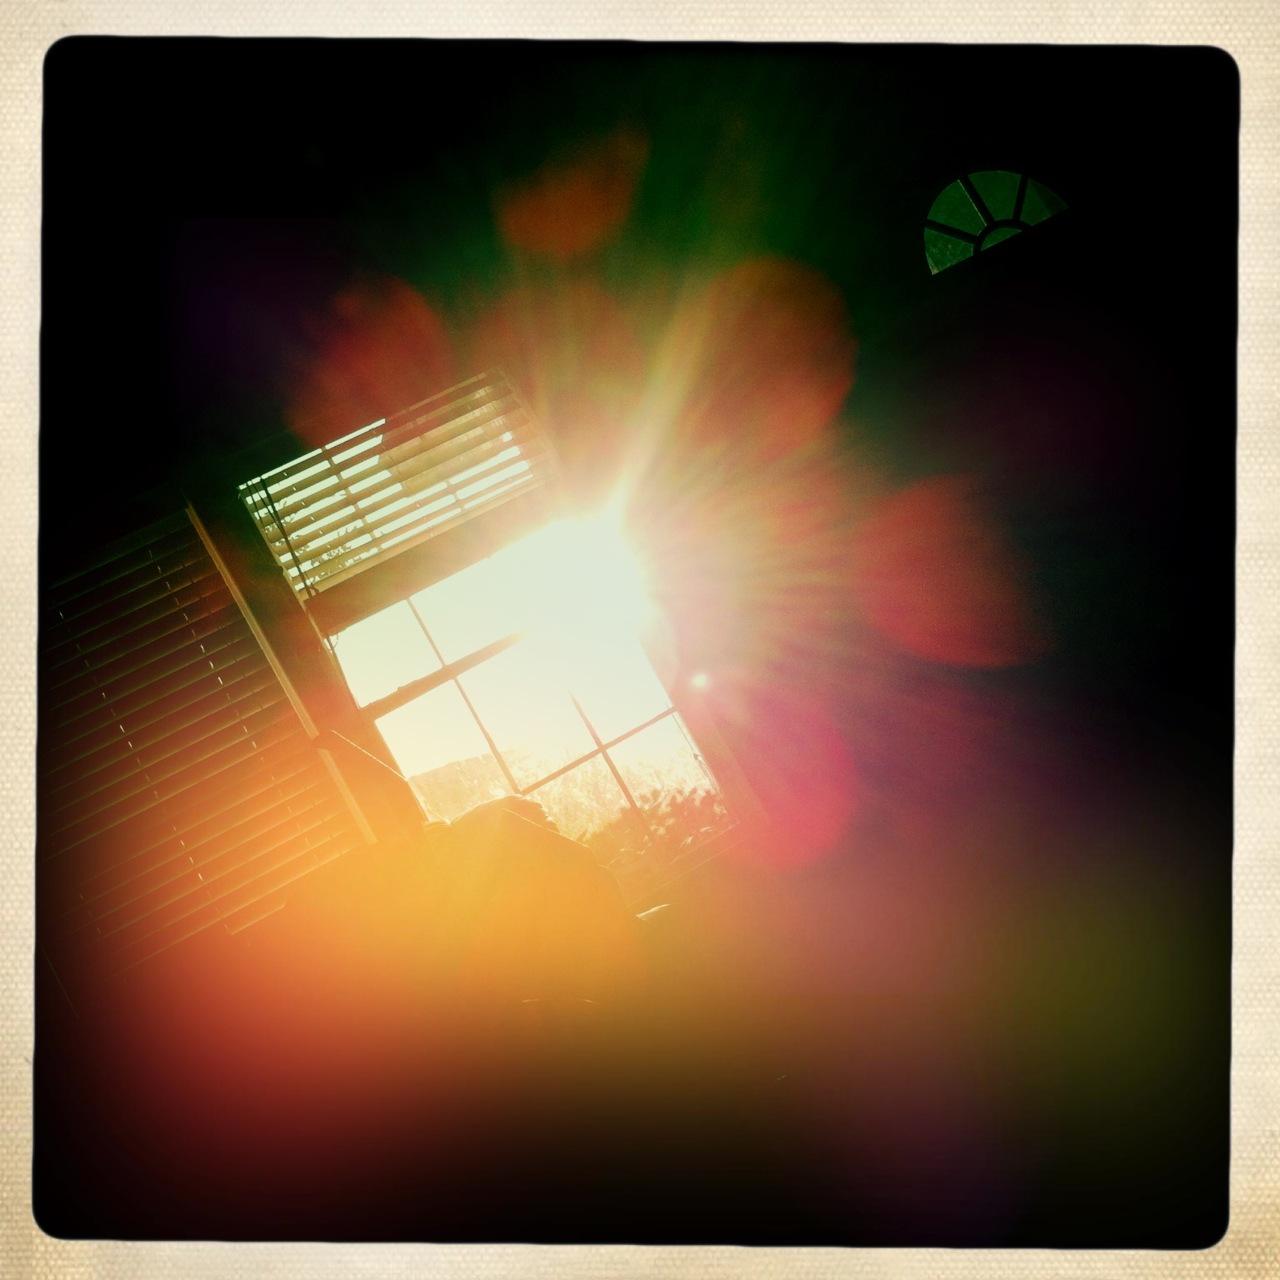 Morning window sun 5 John S Lens, Ina's 1969 Film, Dreampop Flash,